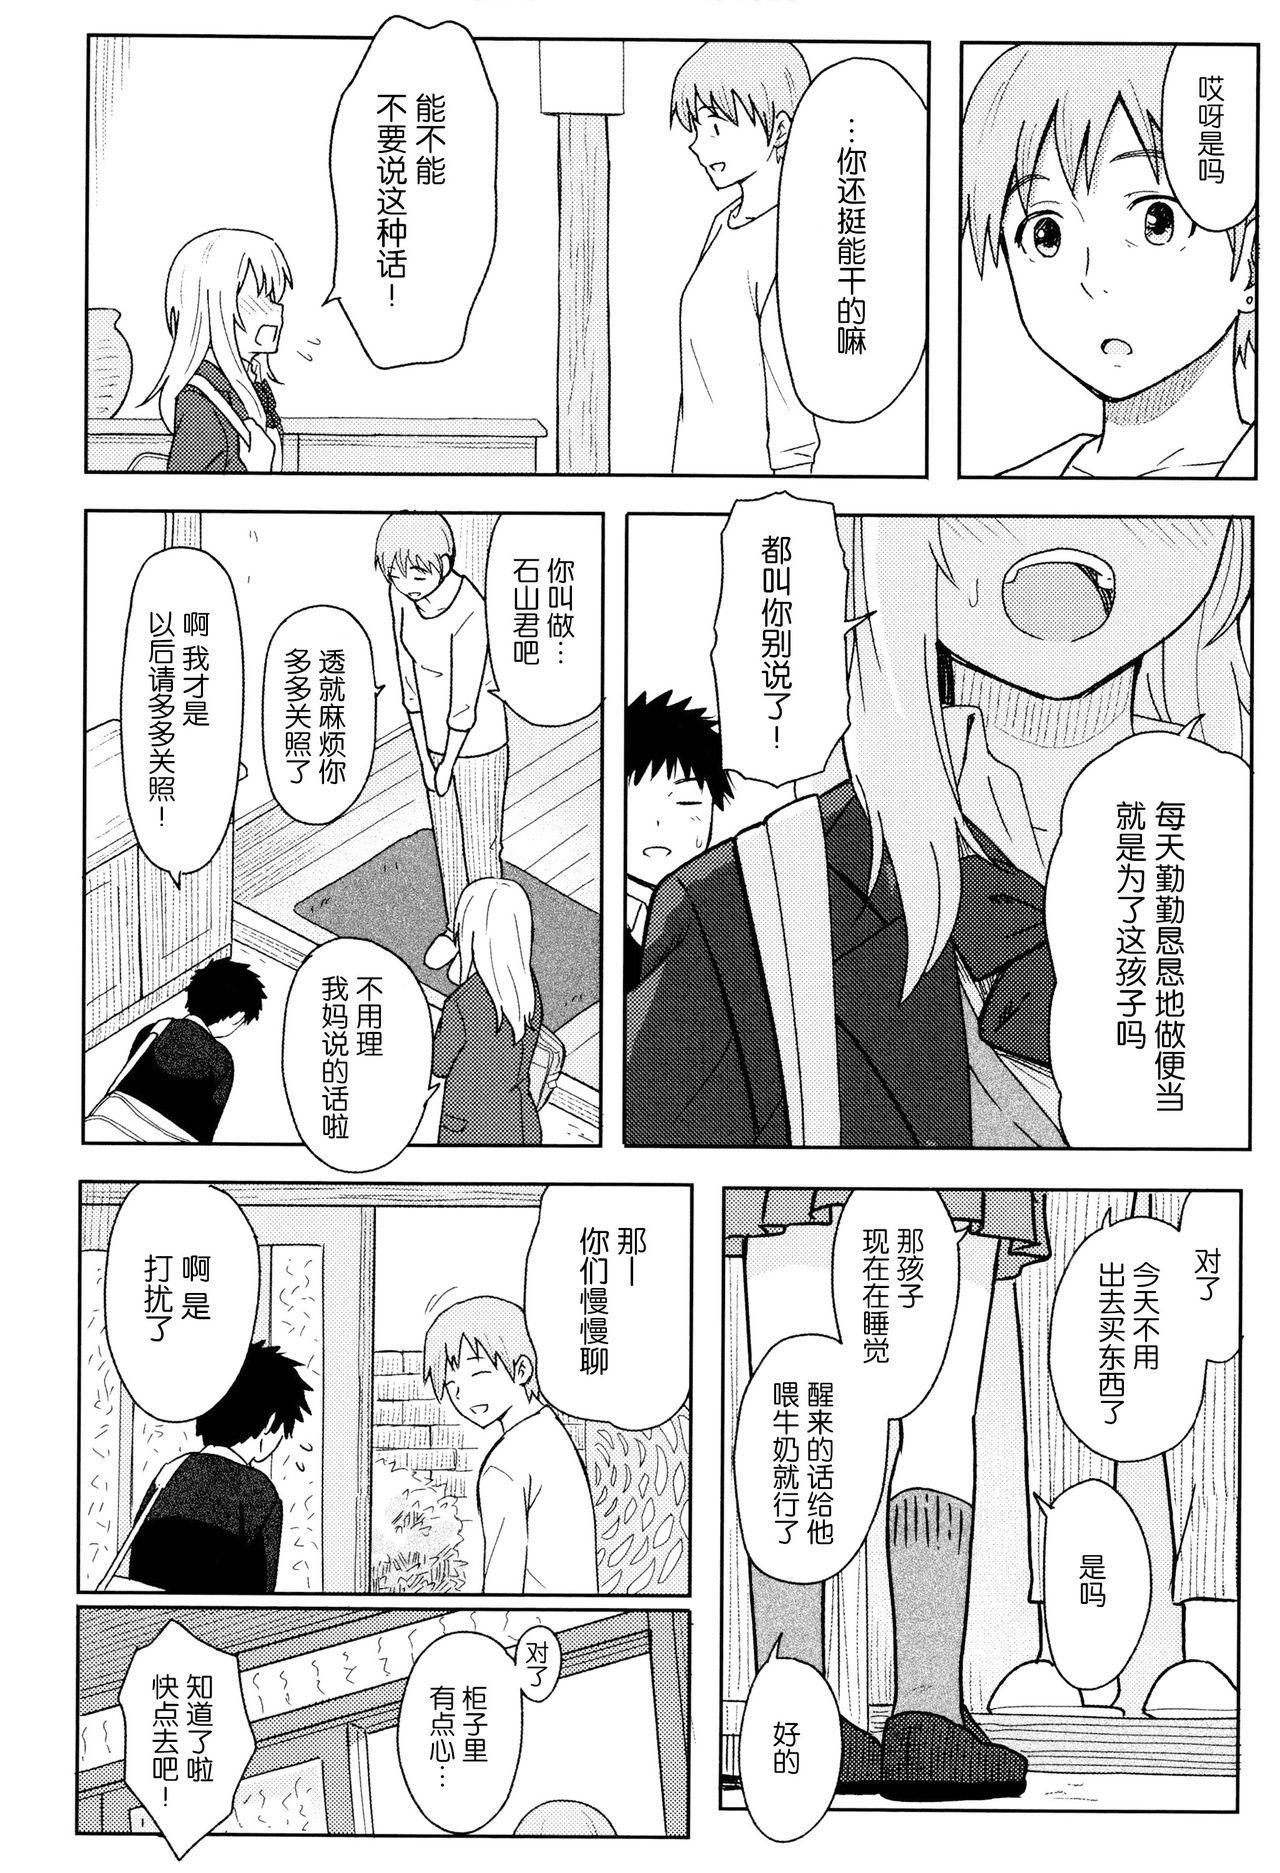 Tokubetsu na Mainichi - Special daily 14